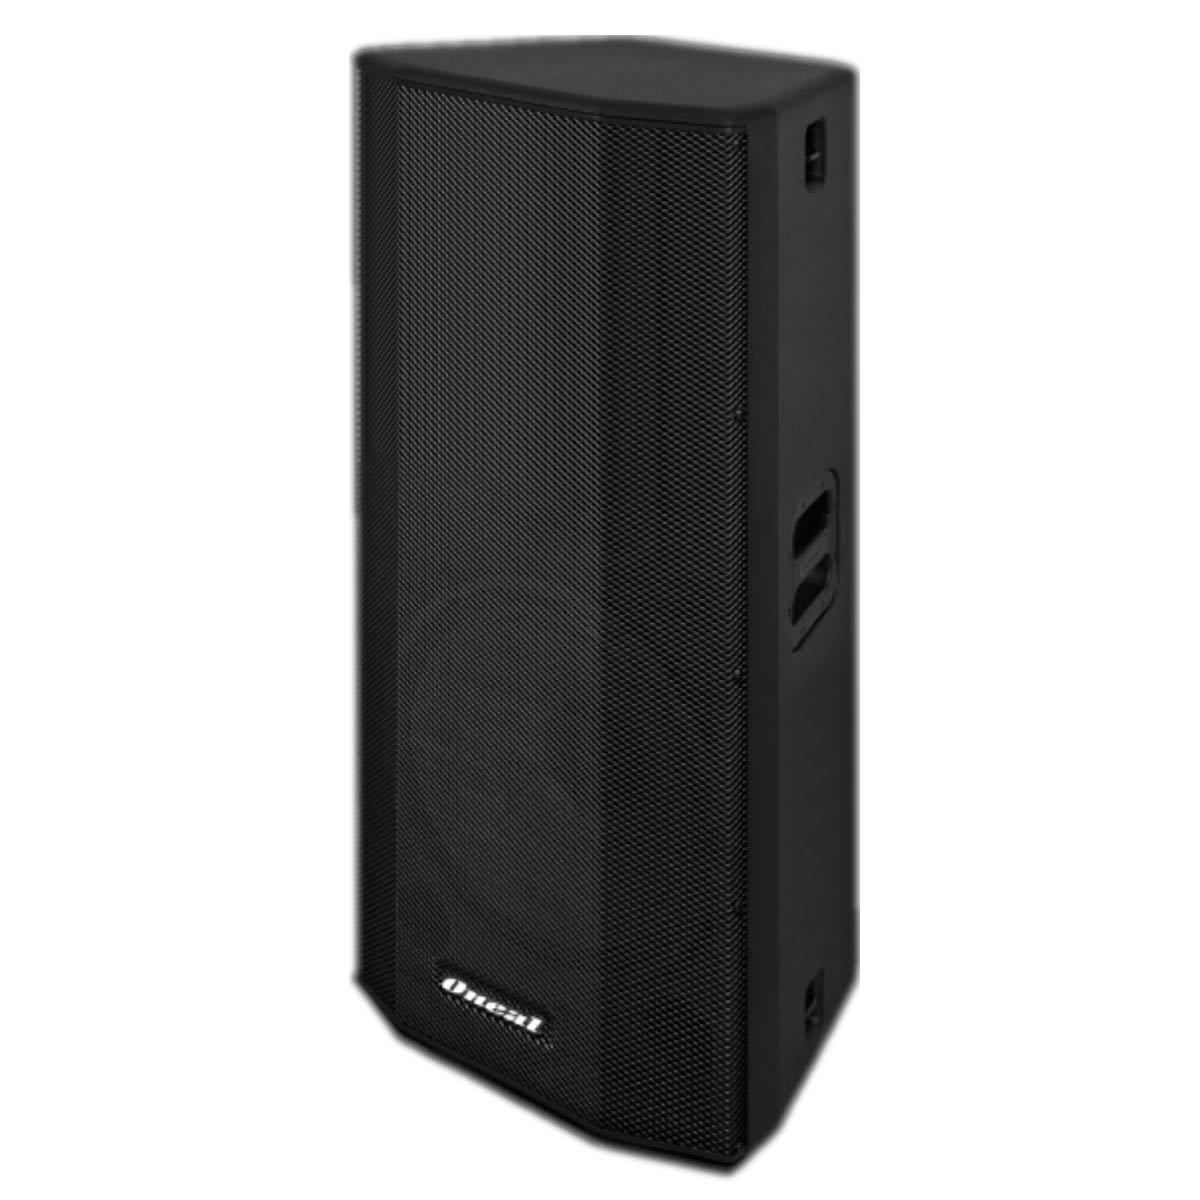 Caixa Ativa Fal 2x15 Pol 650W c/ USB / Bluetooth - OPB 5050 Oneal